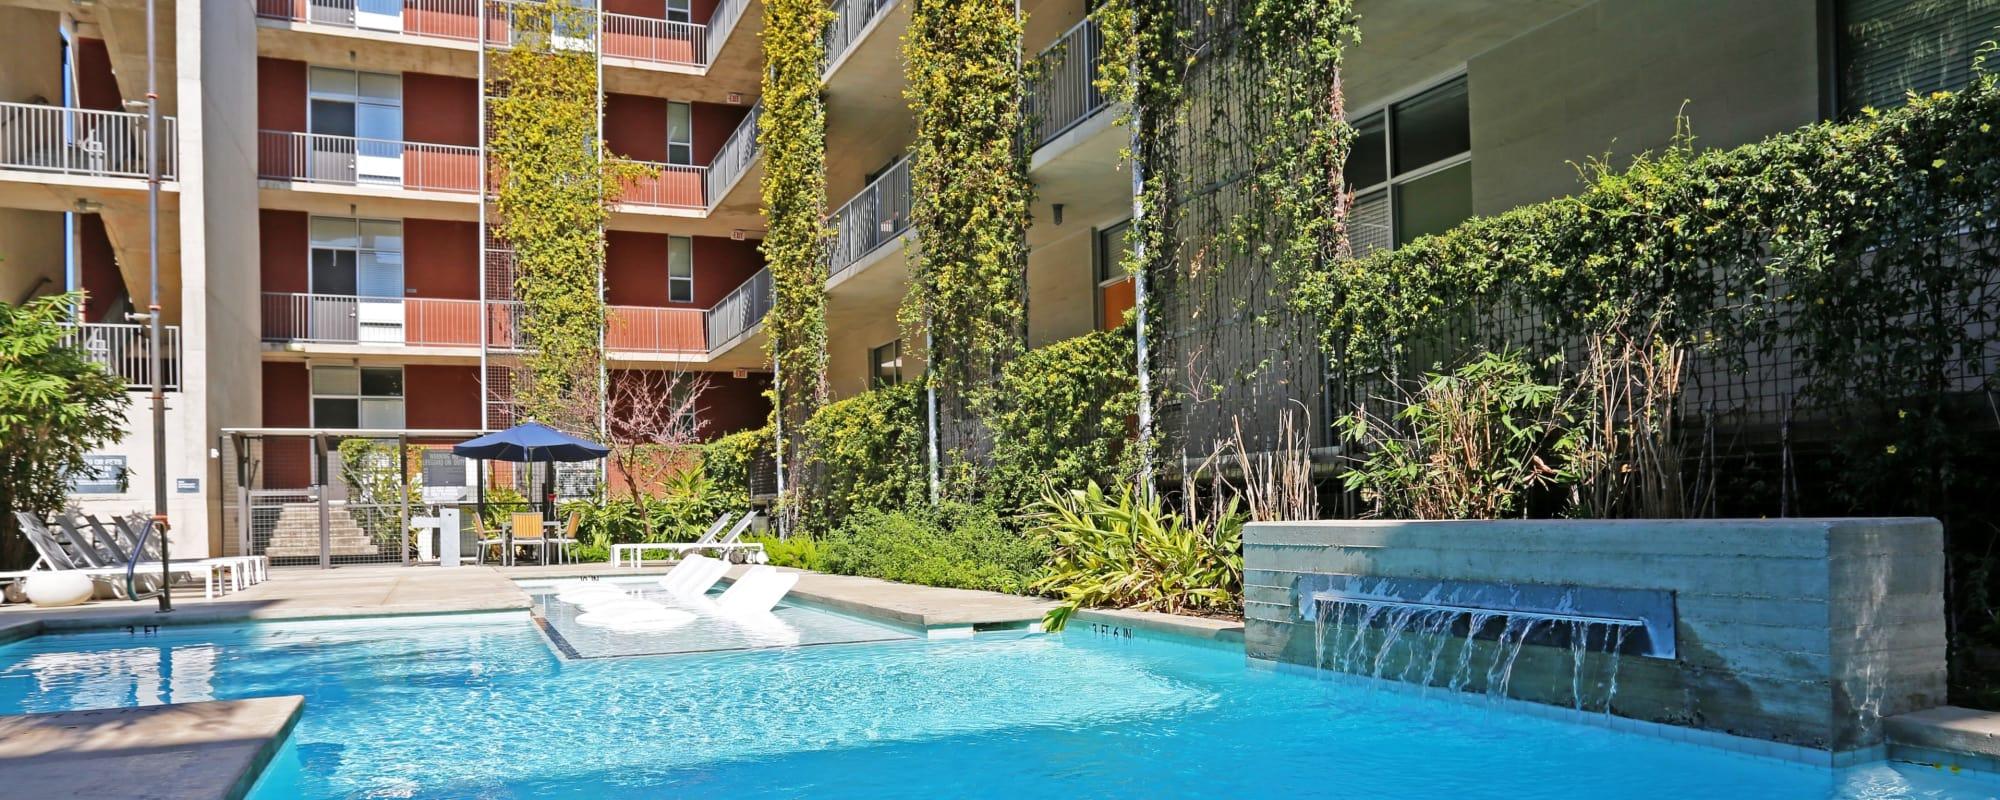 Downtown San Antonio Tx Apartments For Rent 1221